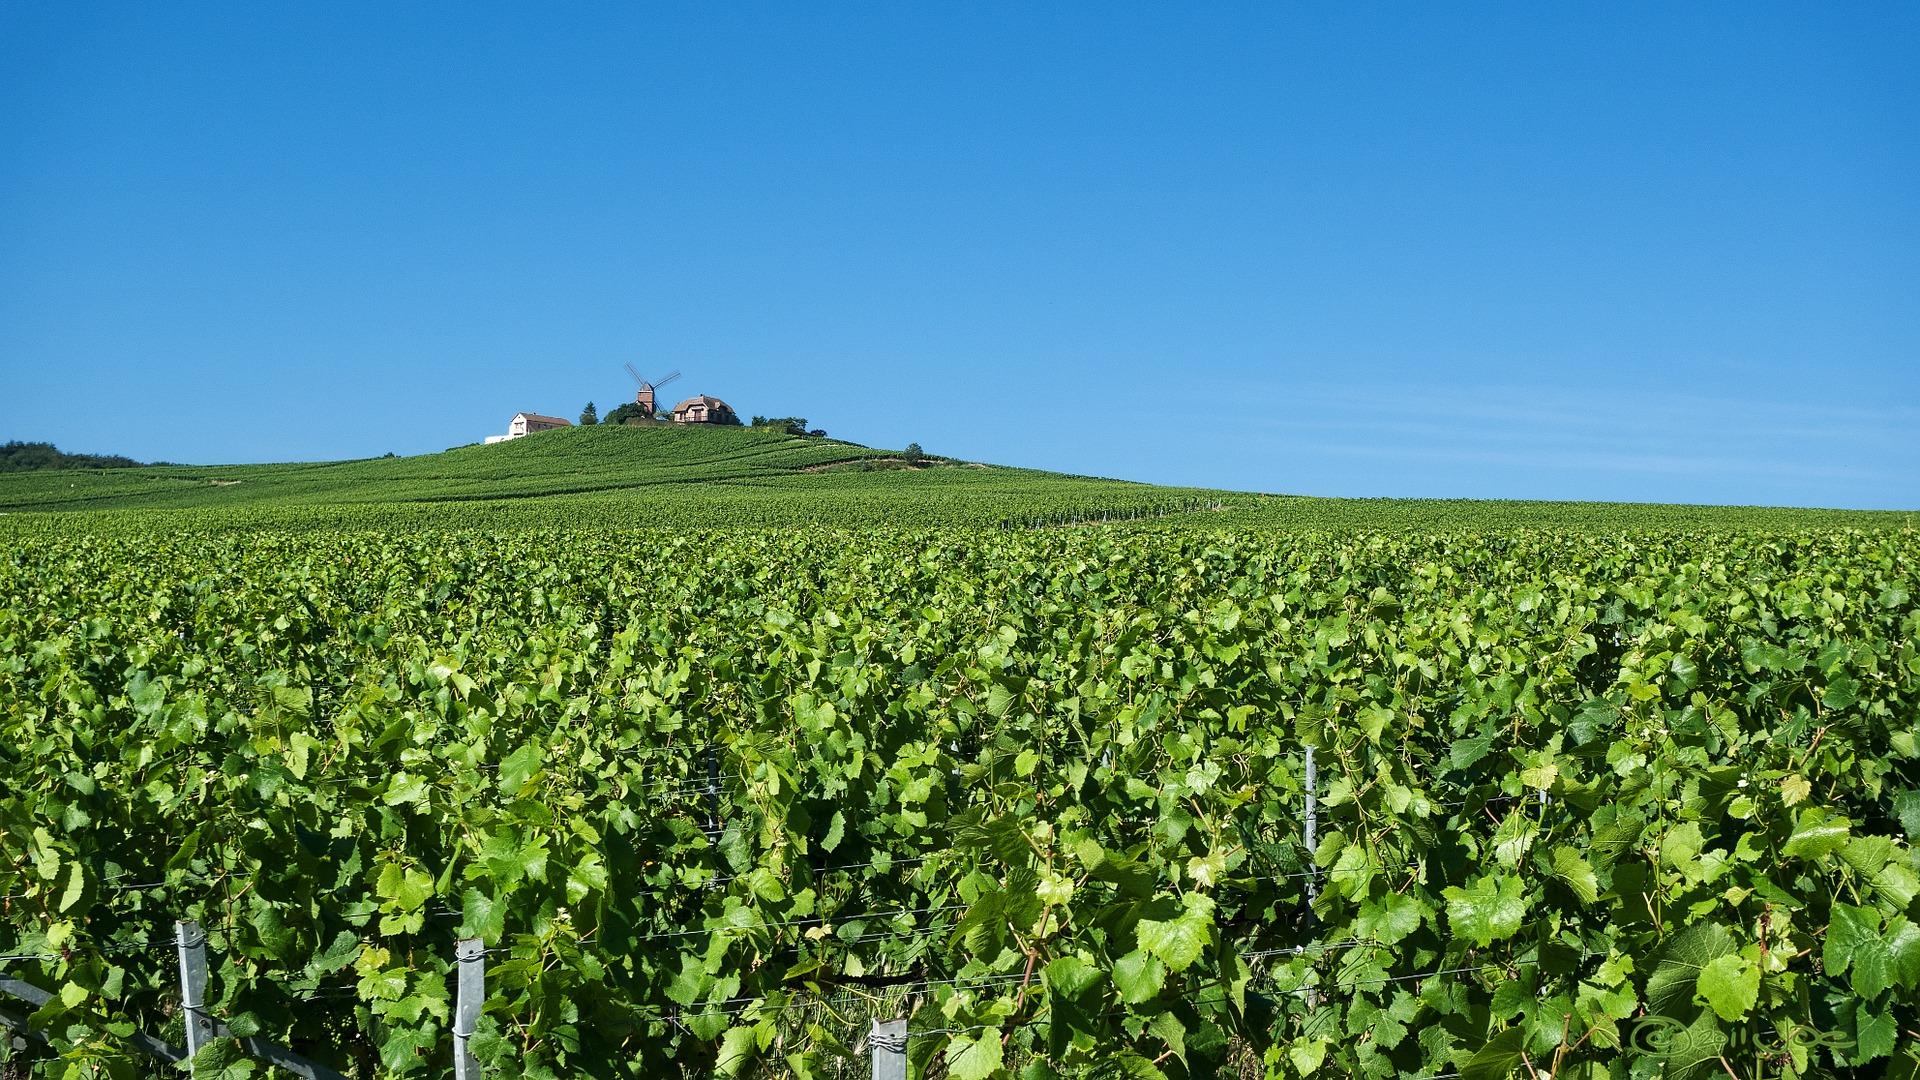 Vineyard in Champagne region